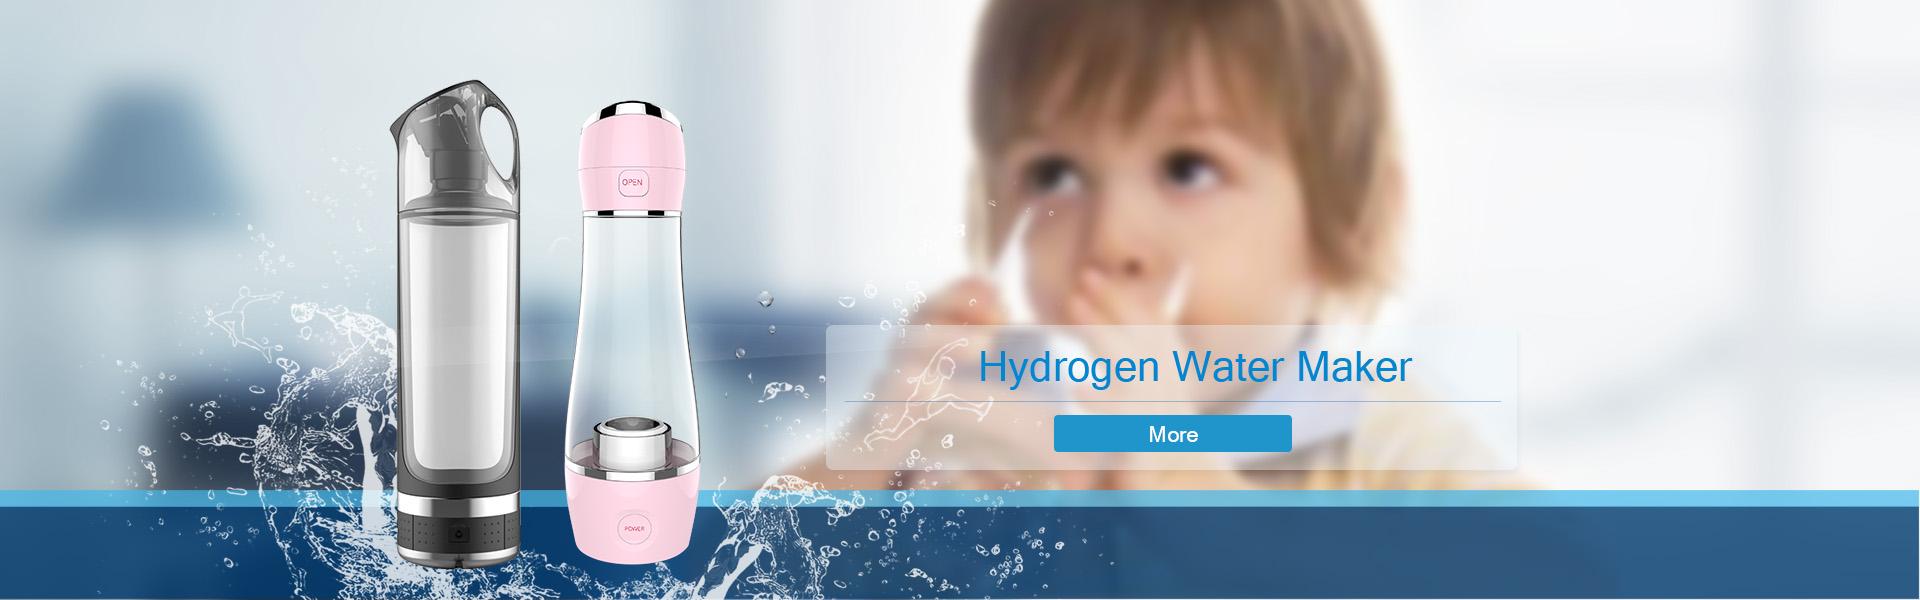 hydrogen water maker banner